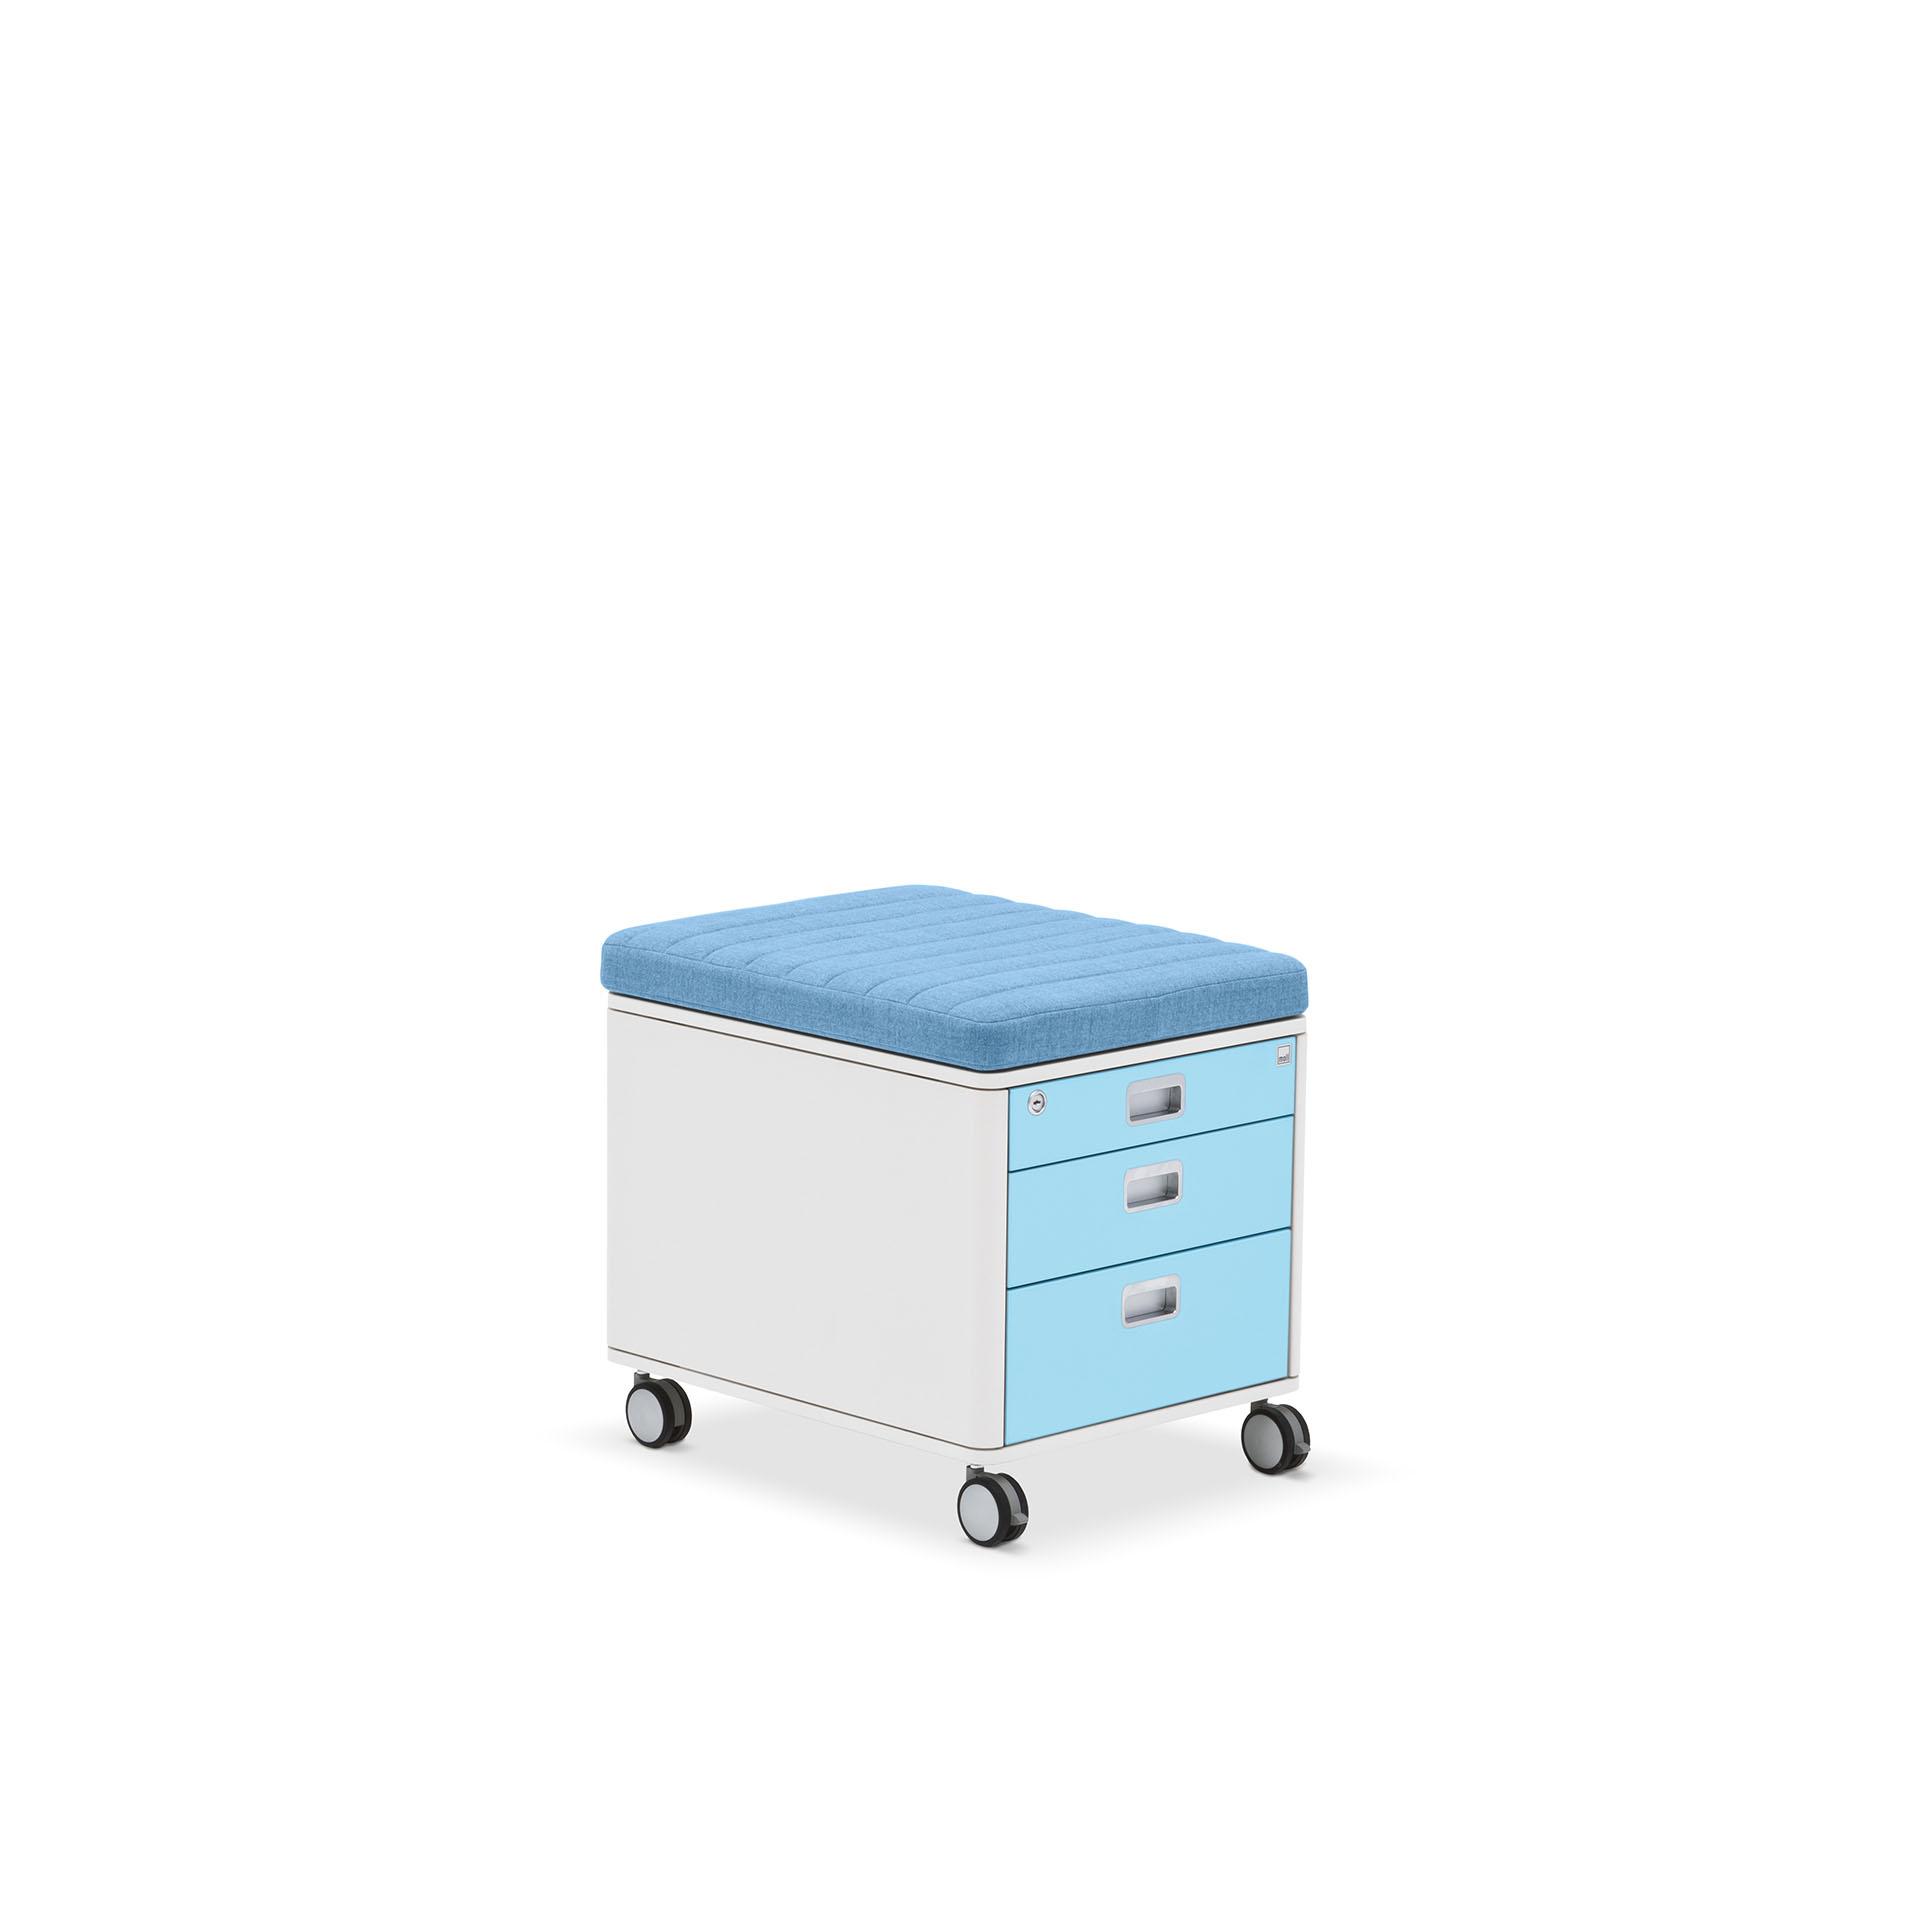 moll-unique-container-C7-hellbau-Pad-hellblau-Kopie1